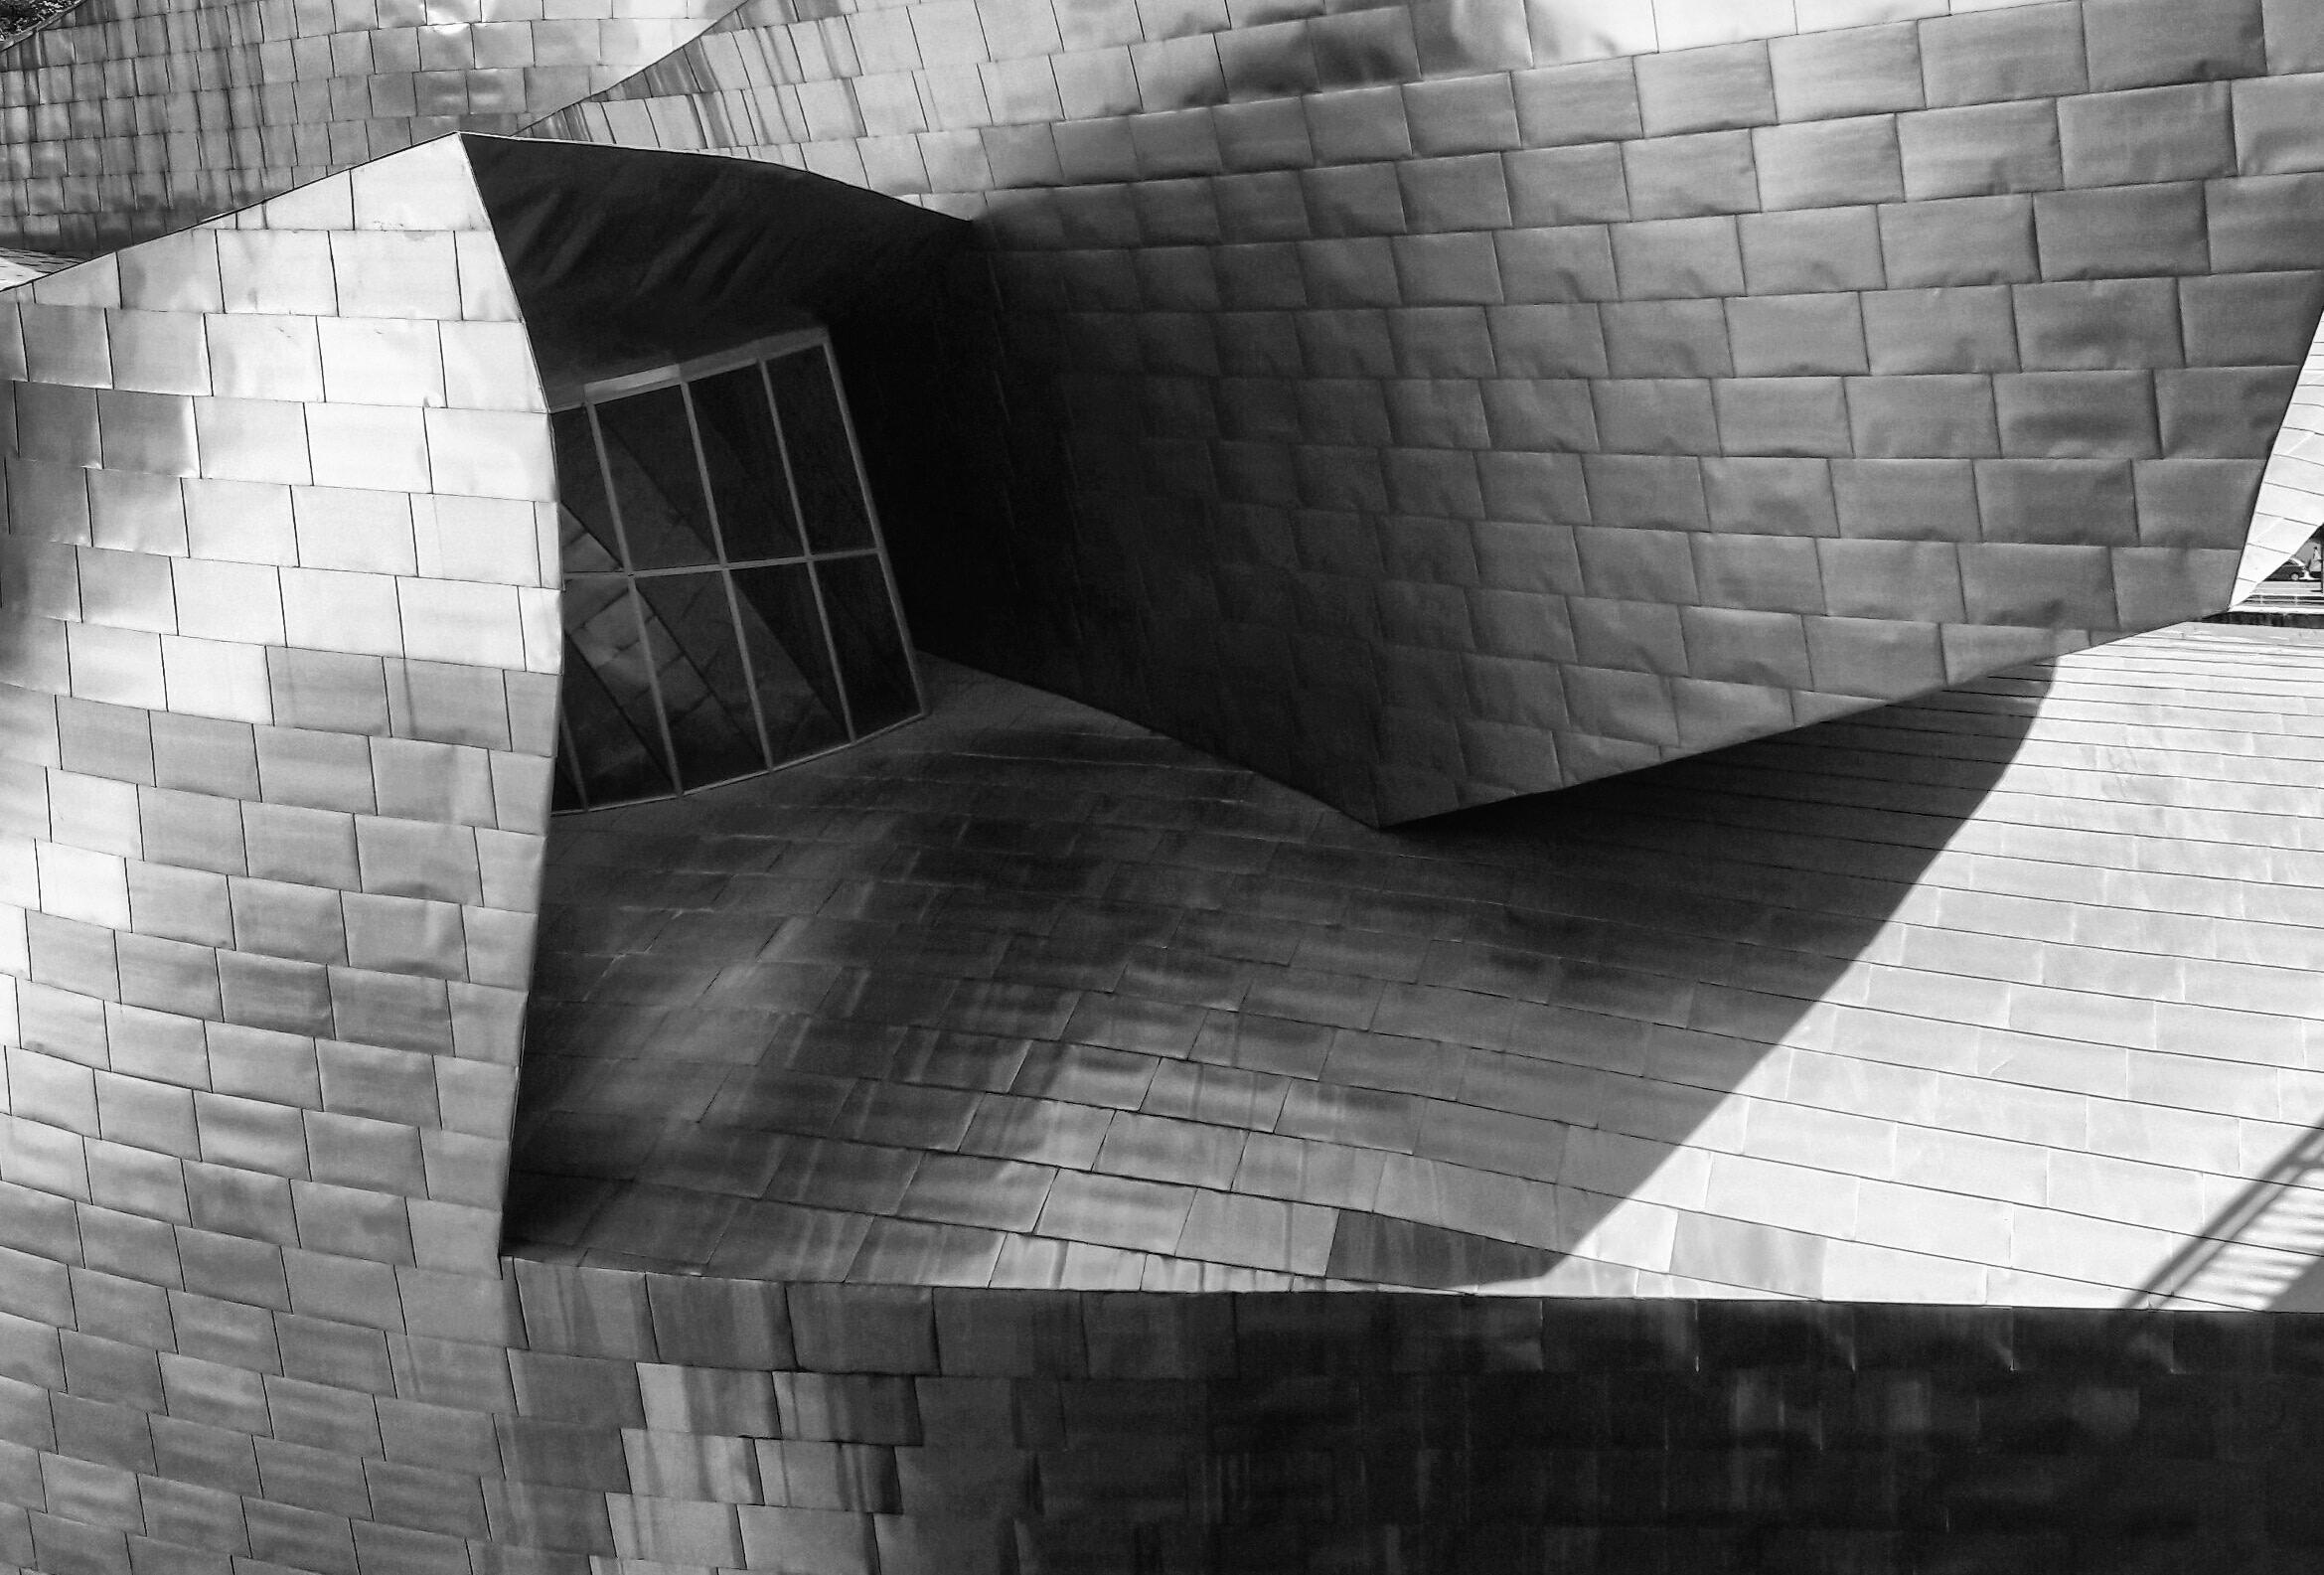 Guggenheim Museum Architectural Marvels